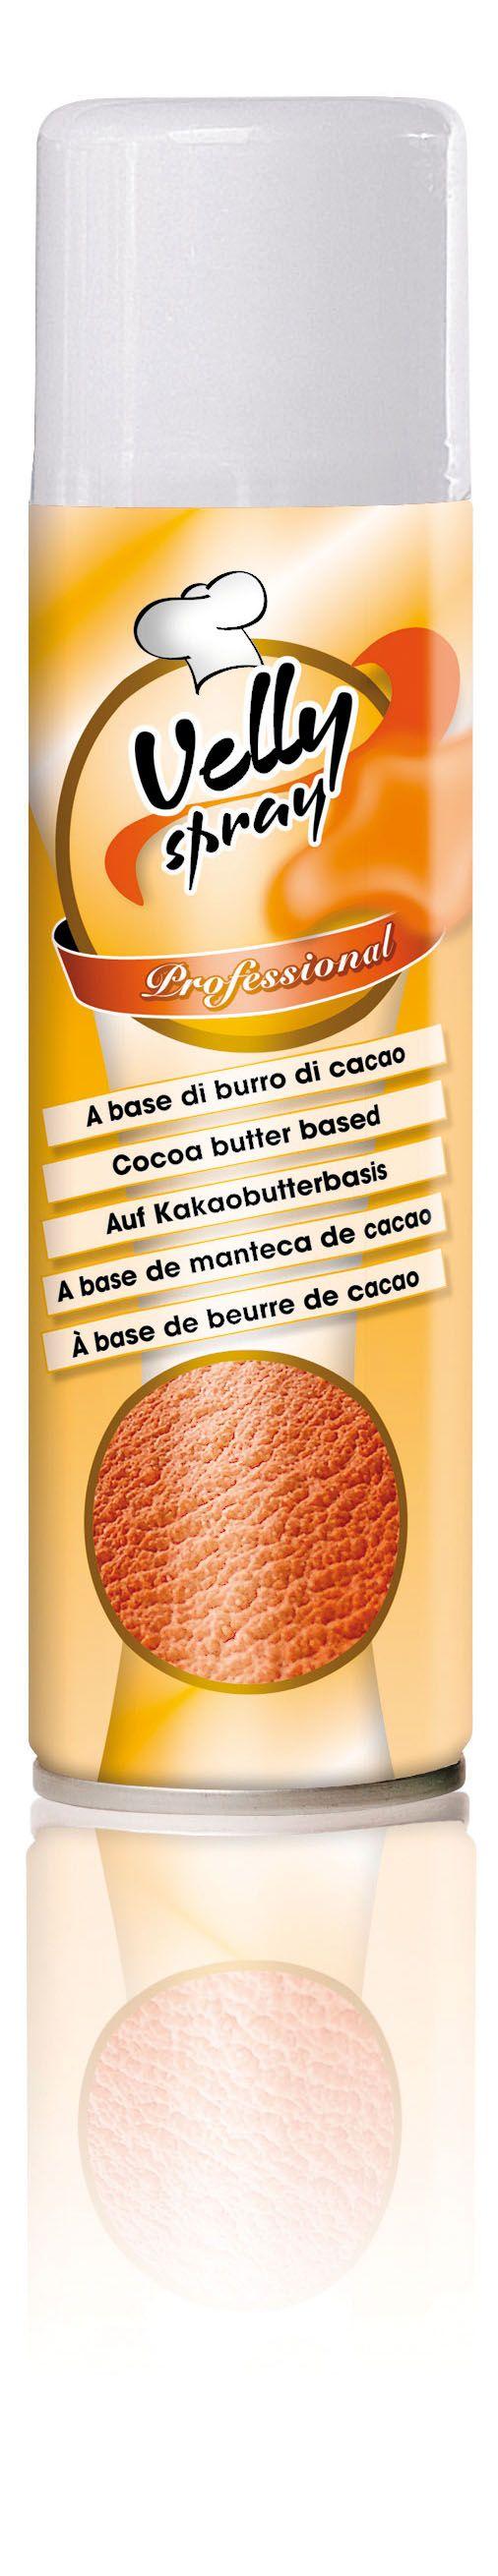 velly spray bombe rouge pro en vente sur cuisine addict achat acheter beurre cacao - Cupcake Colorant Alimentaire